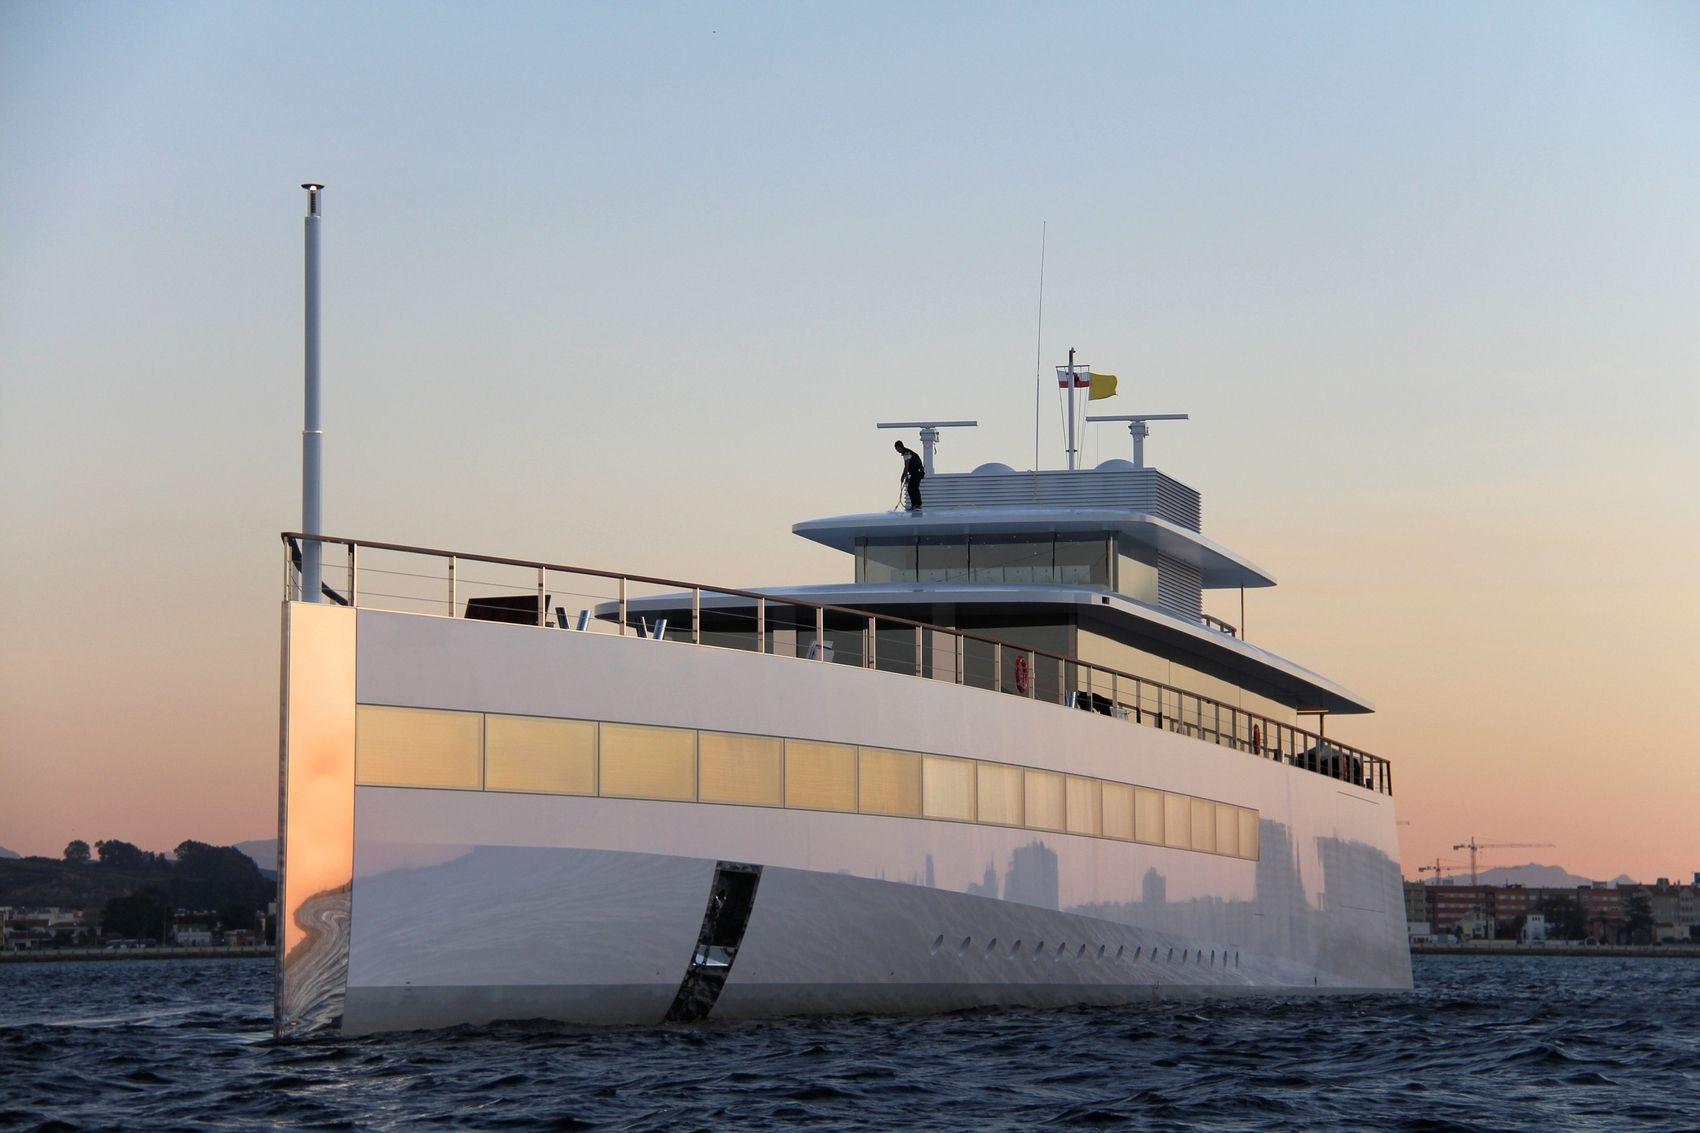 Yacht Design Jobs Venus Yacht  Feadship  Superyacht Times  Boats  Pinterest